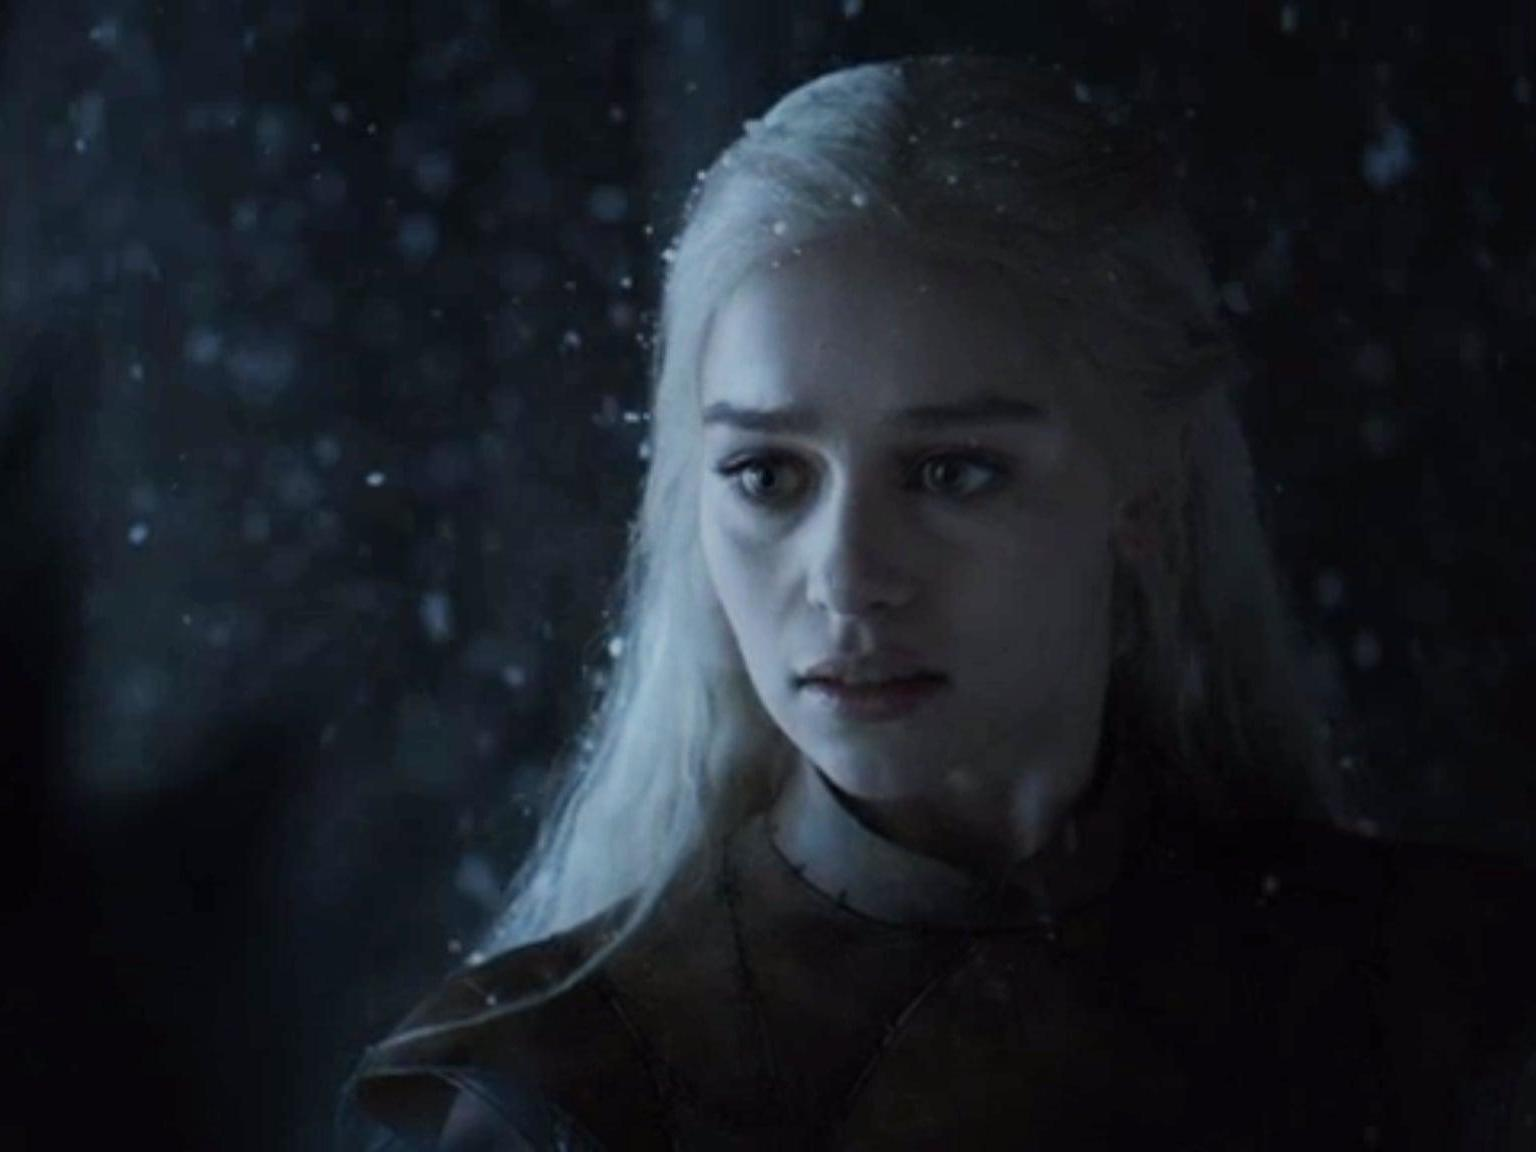 Game of Thrones season 8: Daenerys' vision in season 2 may